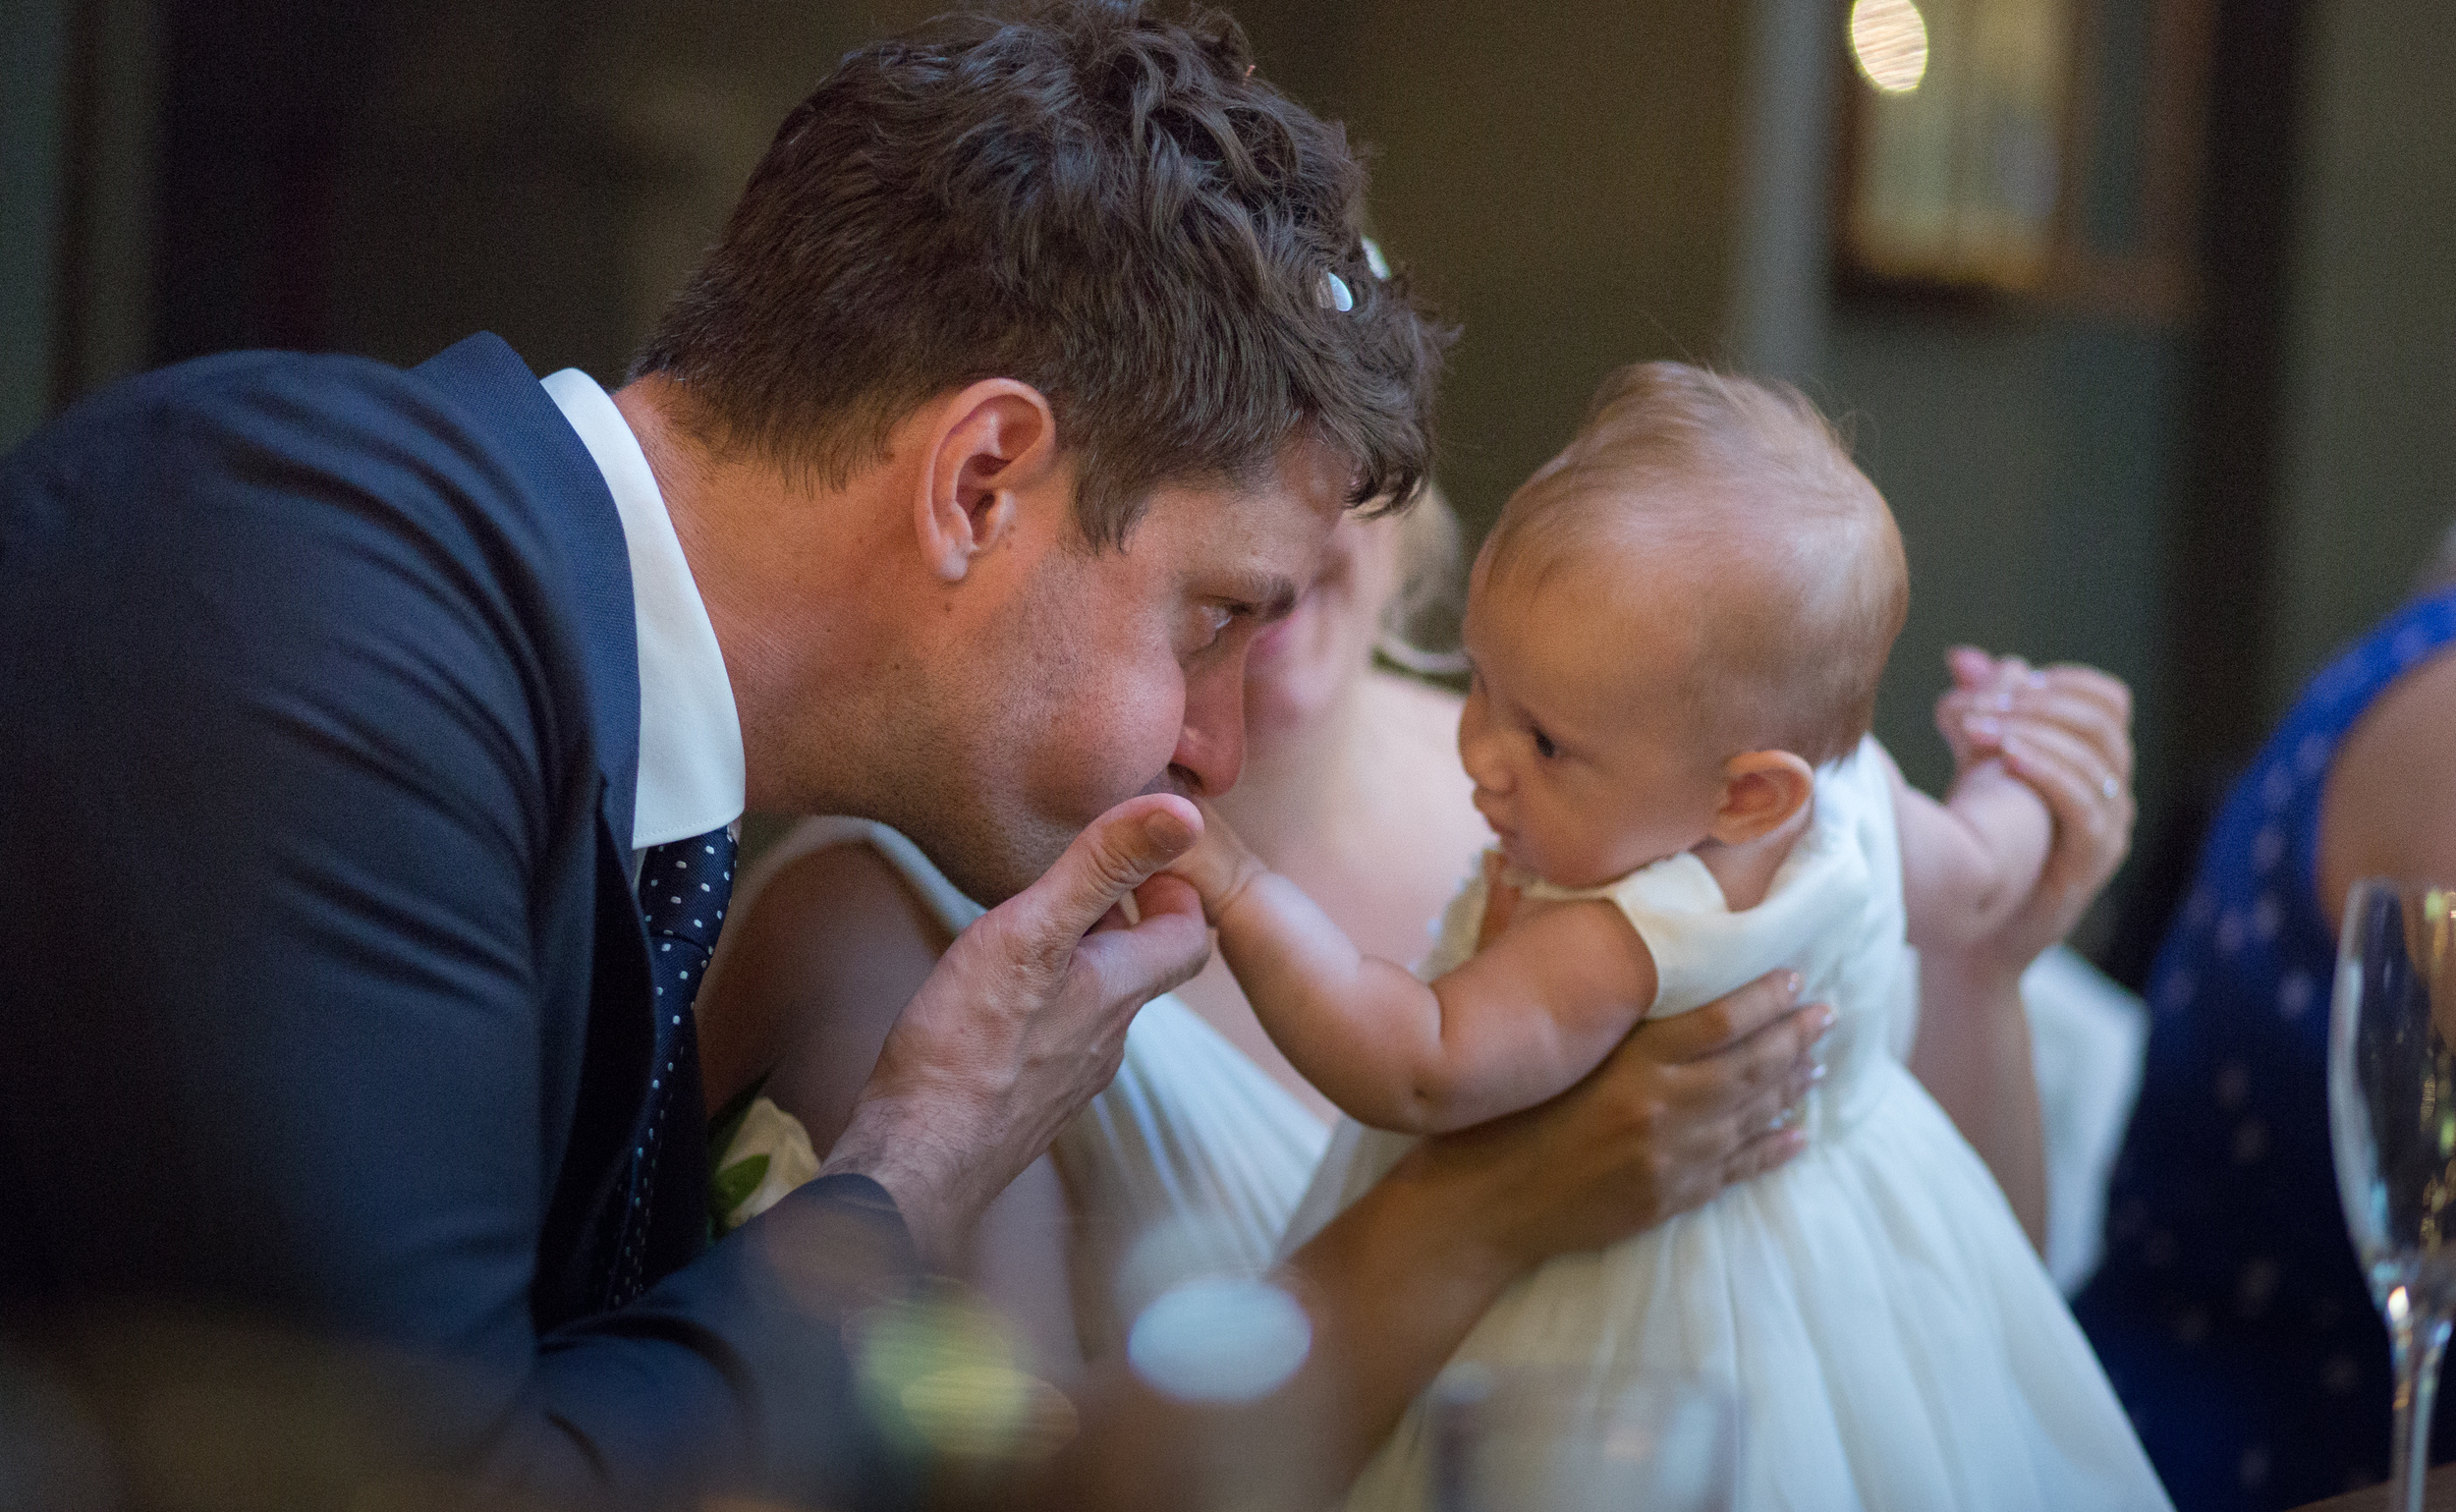 Artisan-of-Clerkenwell-london-groom-baby-1